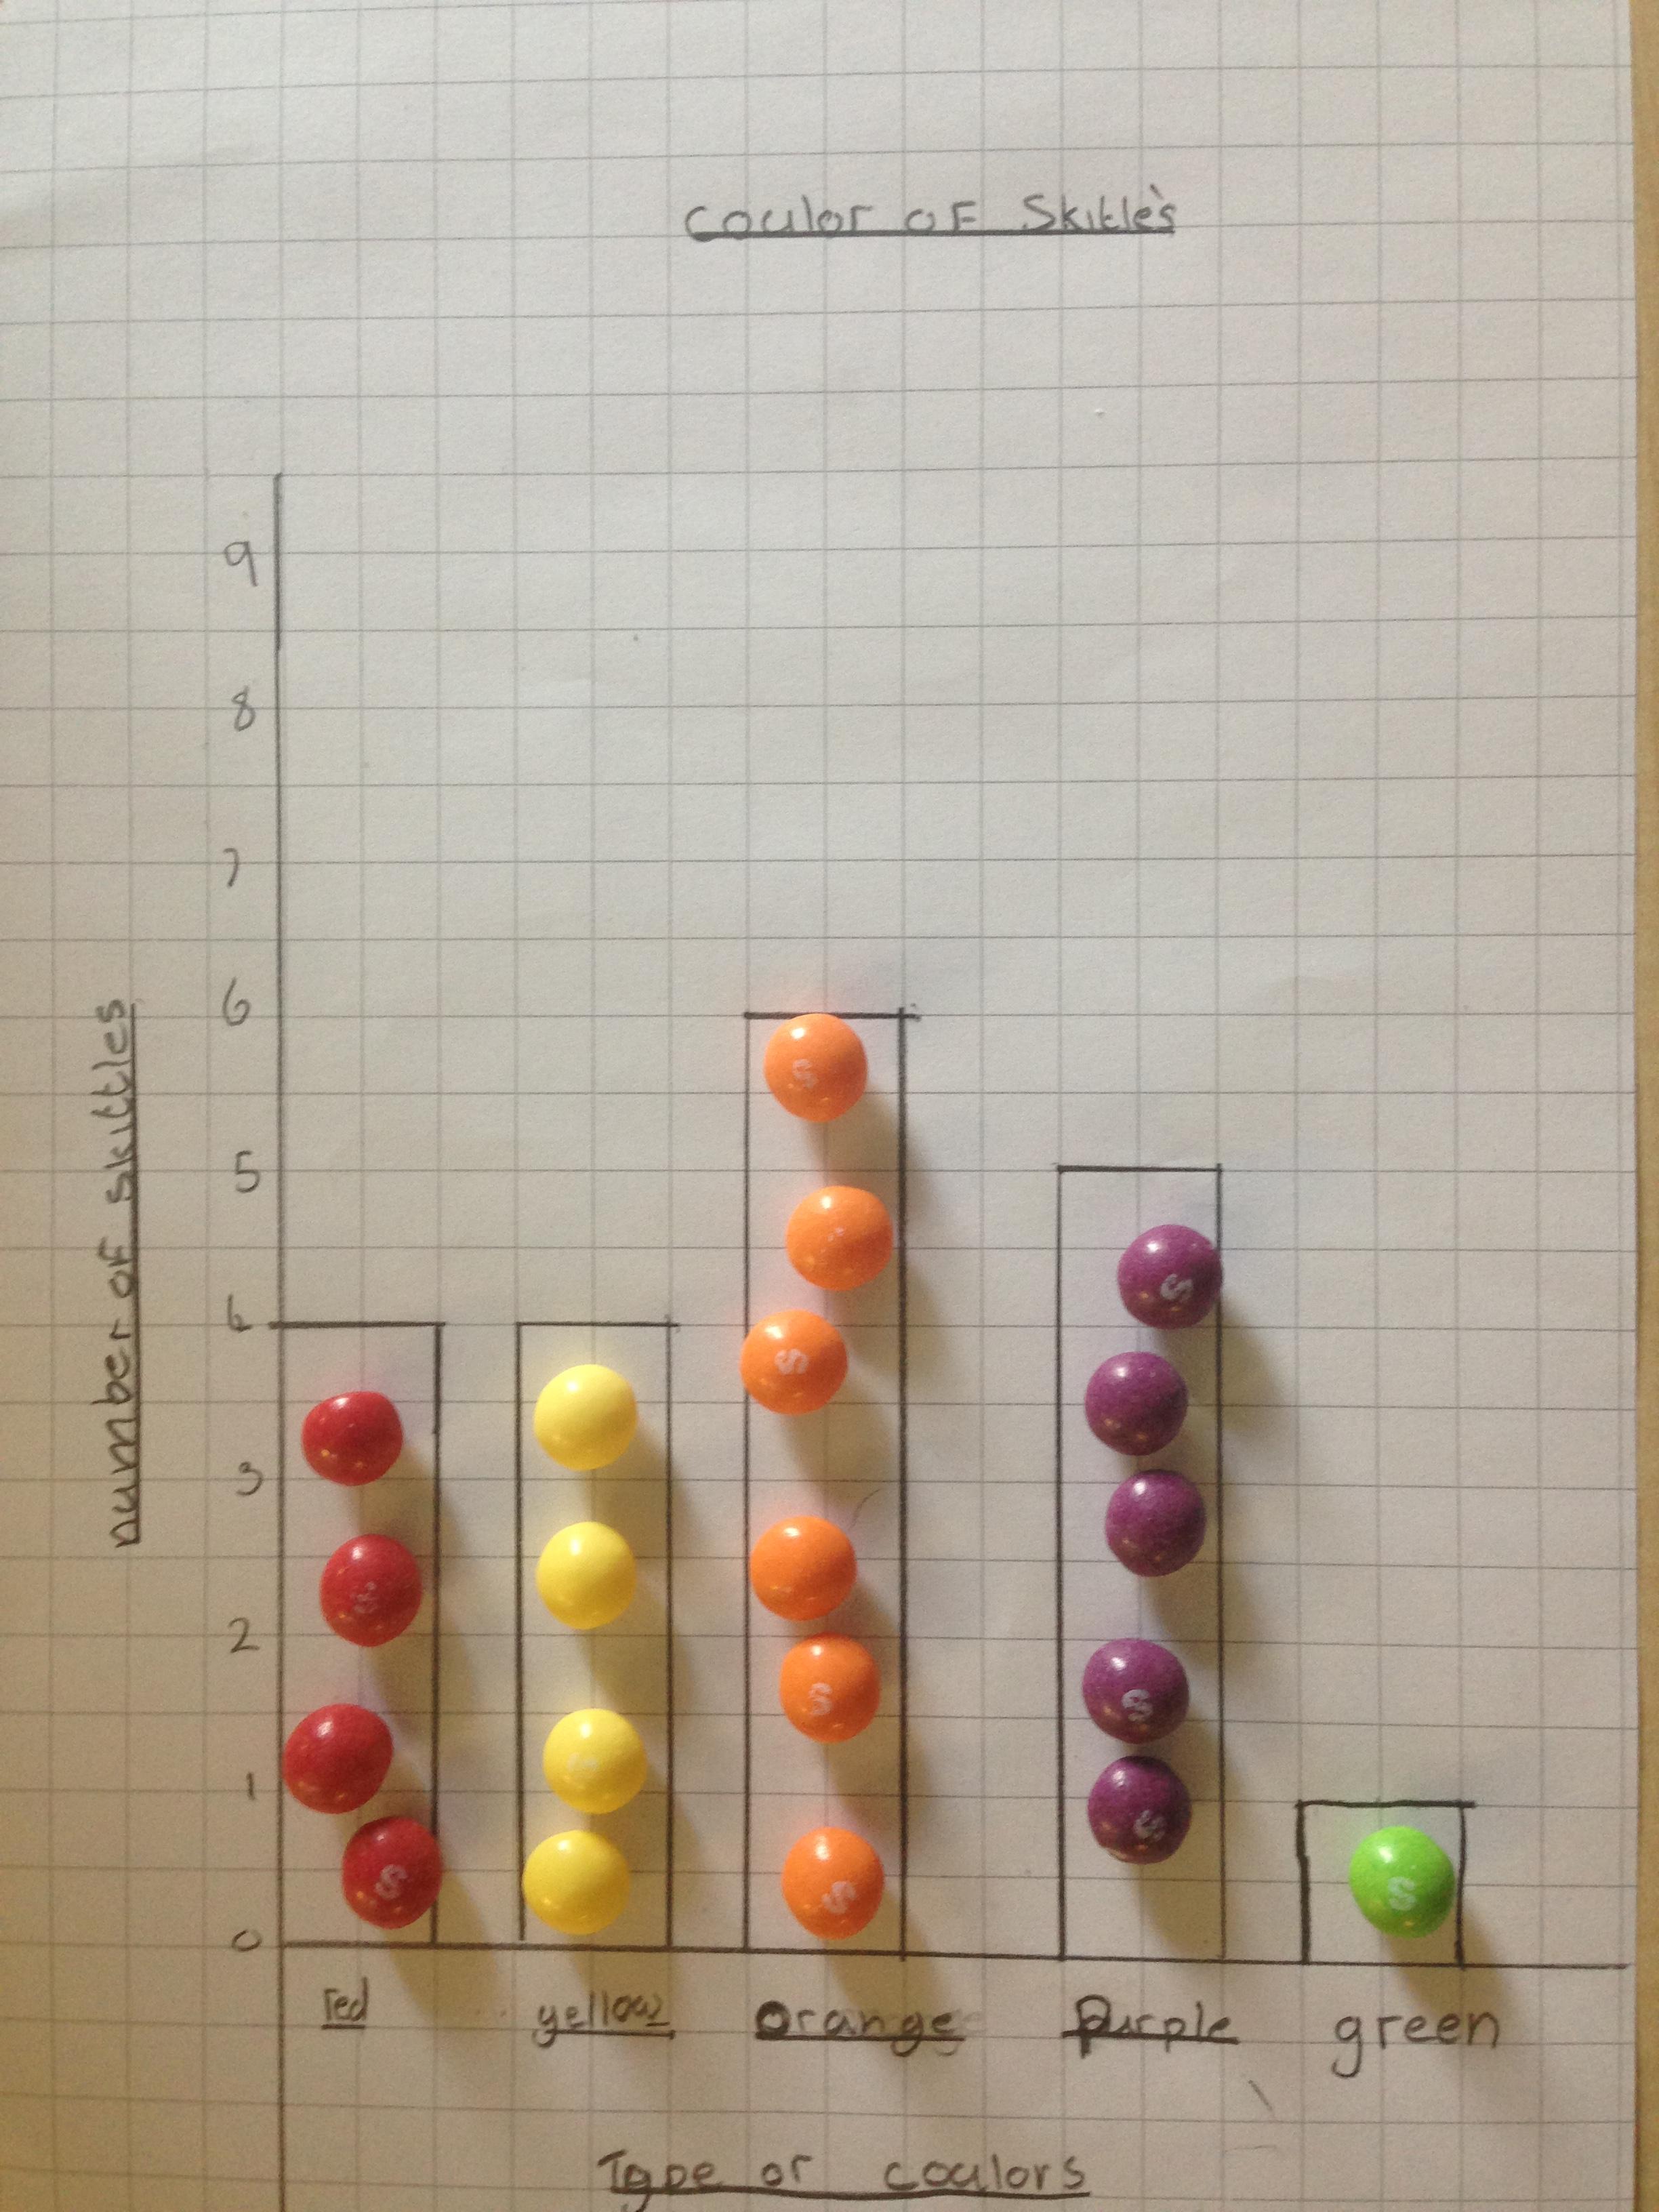 Skittle Bar Graphs Mr Hagendaas Maths